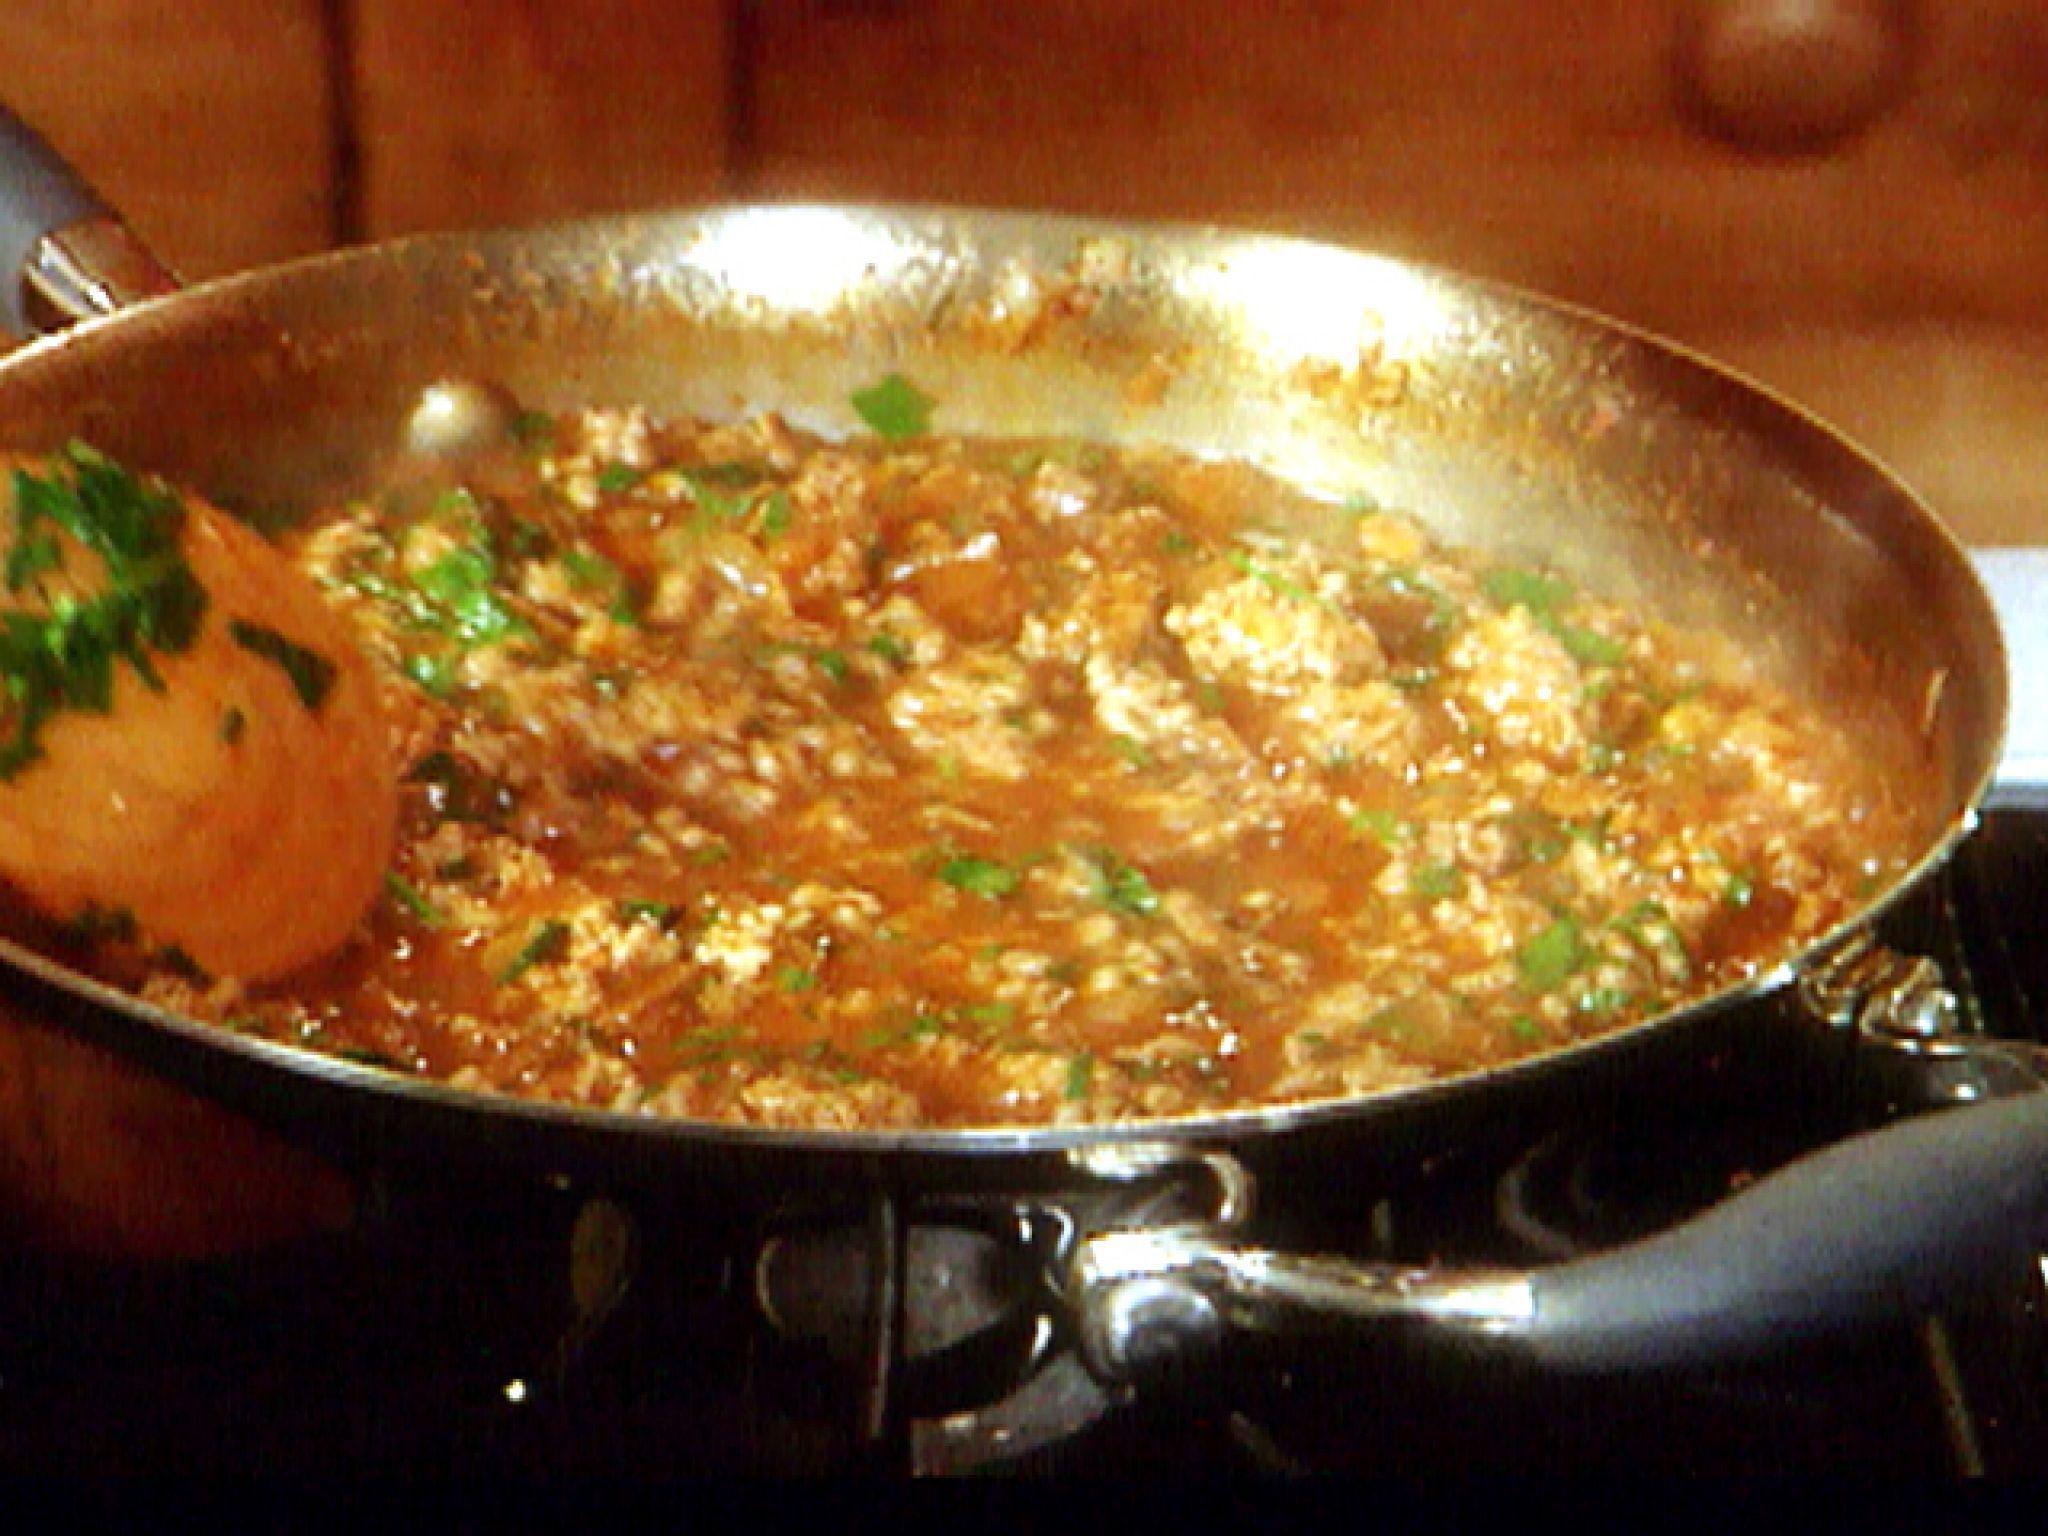 Veal, Pork and Porcini Bolognese Sauce recipe from Michael Chiarello via Food Network